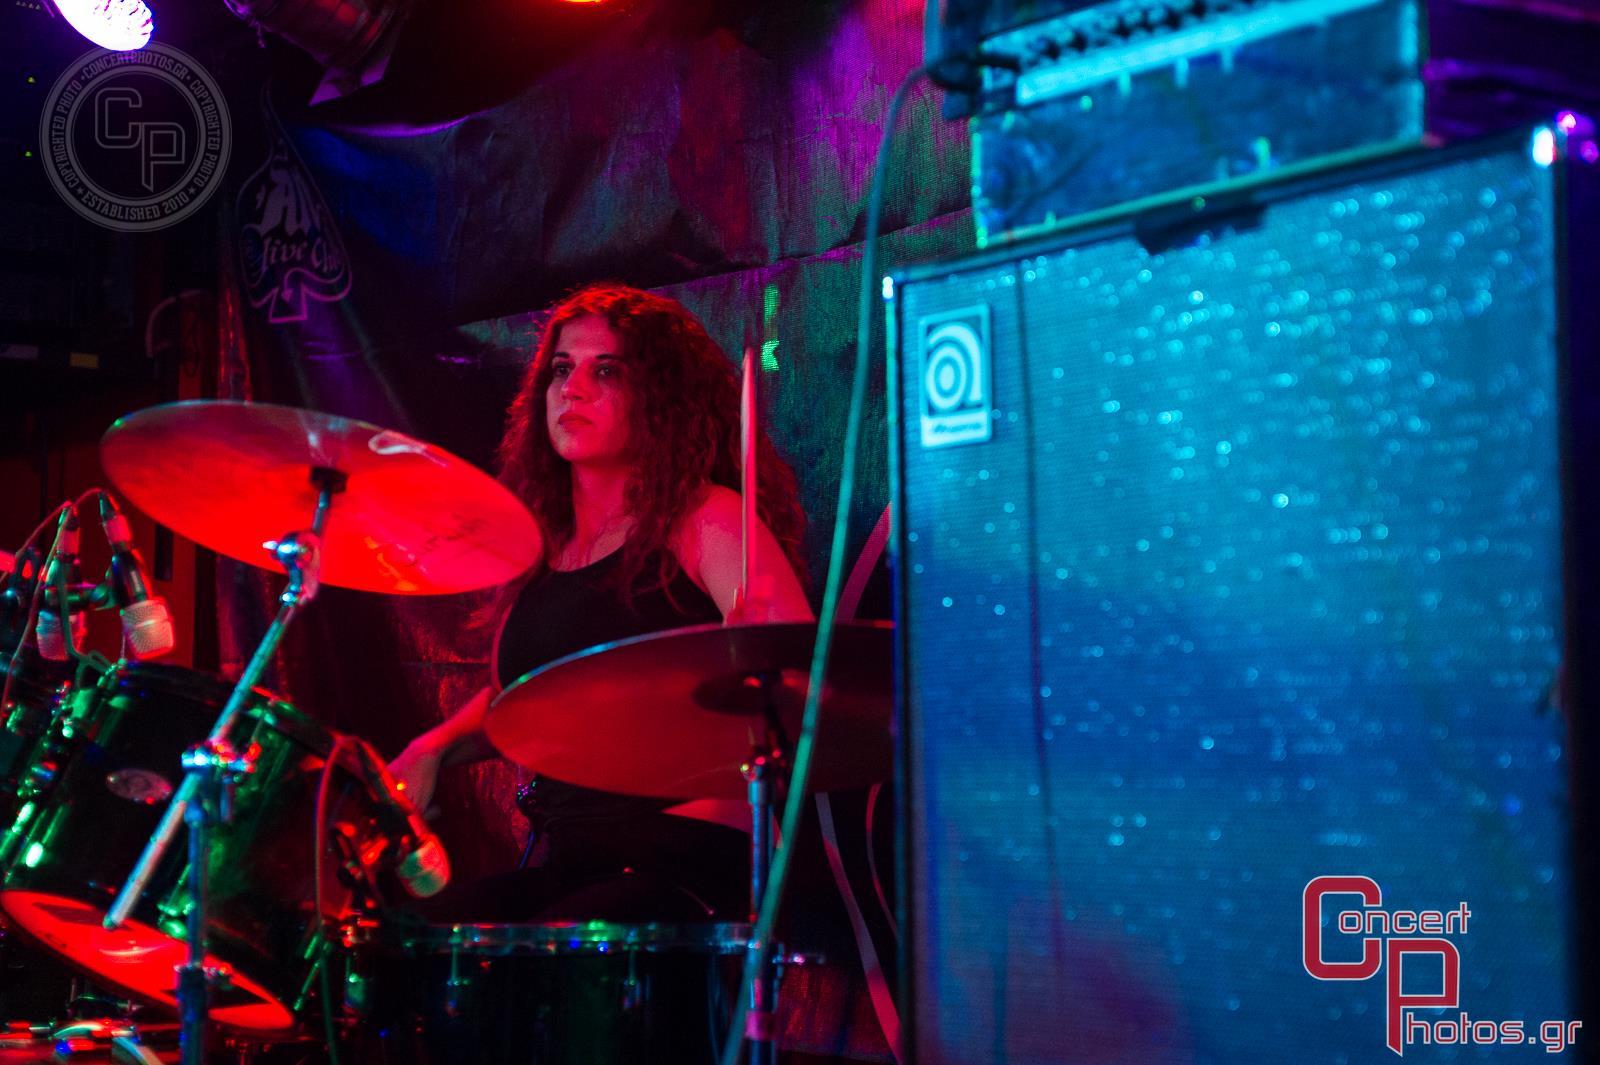 Battle Of The Bands Leg 1-Battle Of The Bands Leg 1 photographer:  - ConcertPhotos - 20141127_0005_39